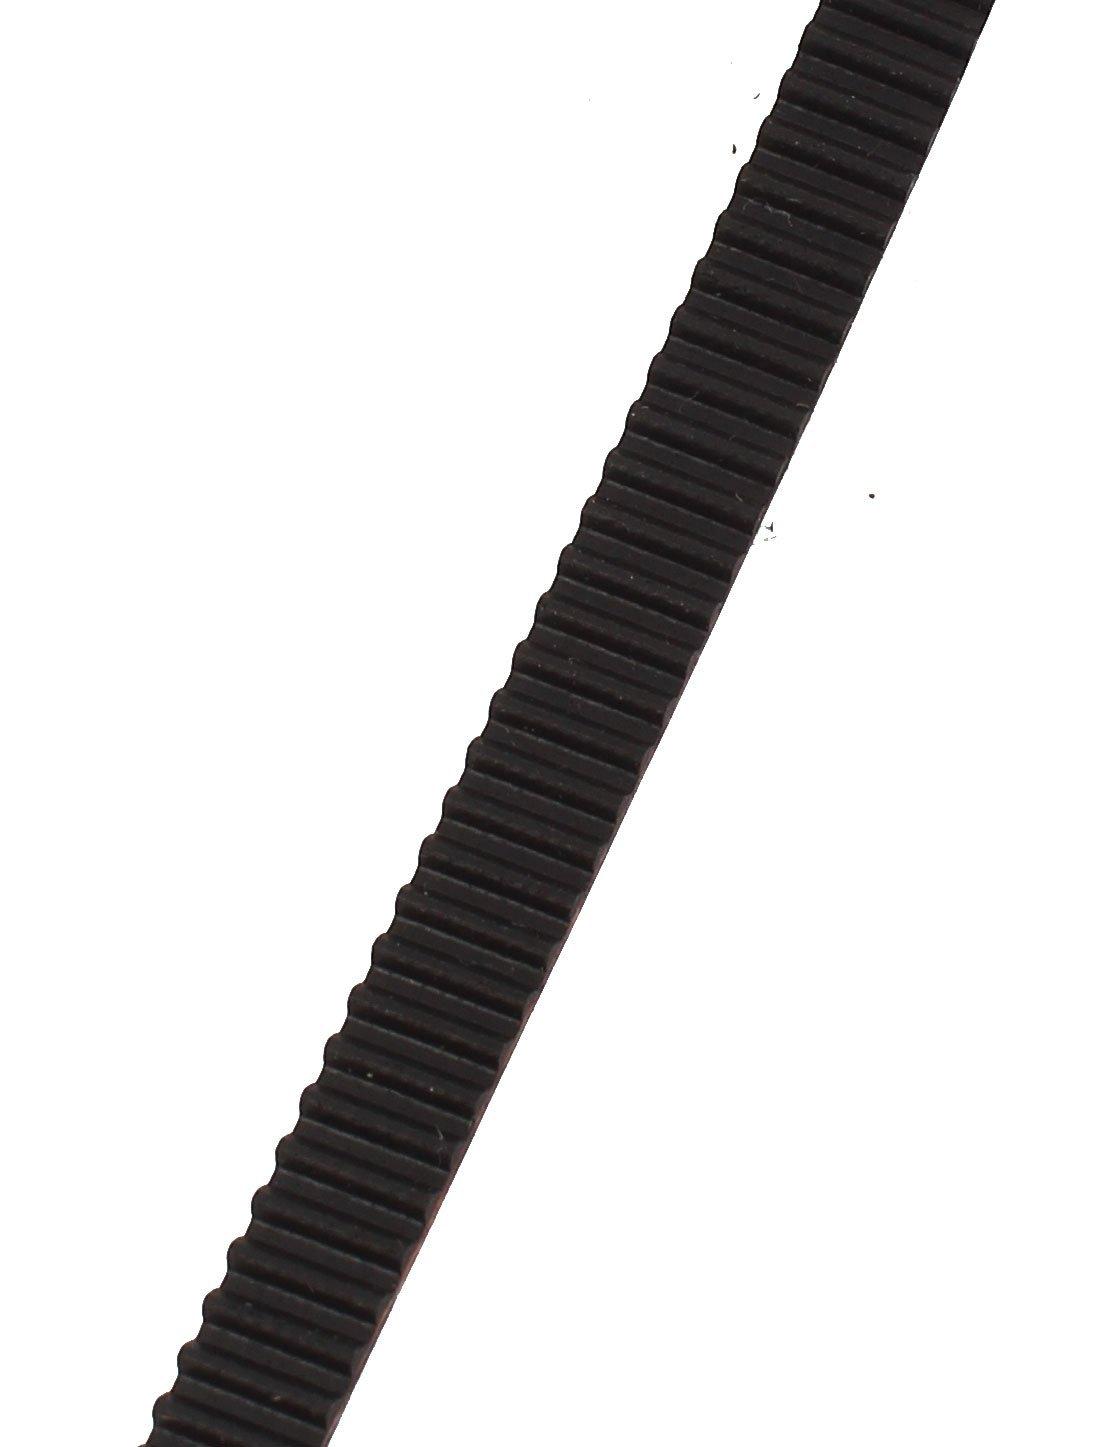 S2M 1M 6 mm de ancho de 2 mm Pitch de boca abierta Correa Negro para impresoras 3D - - Amazon.com